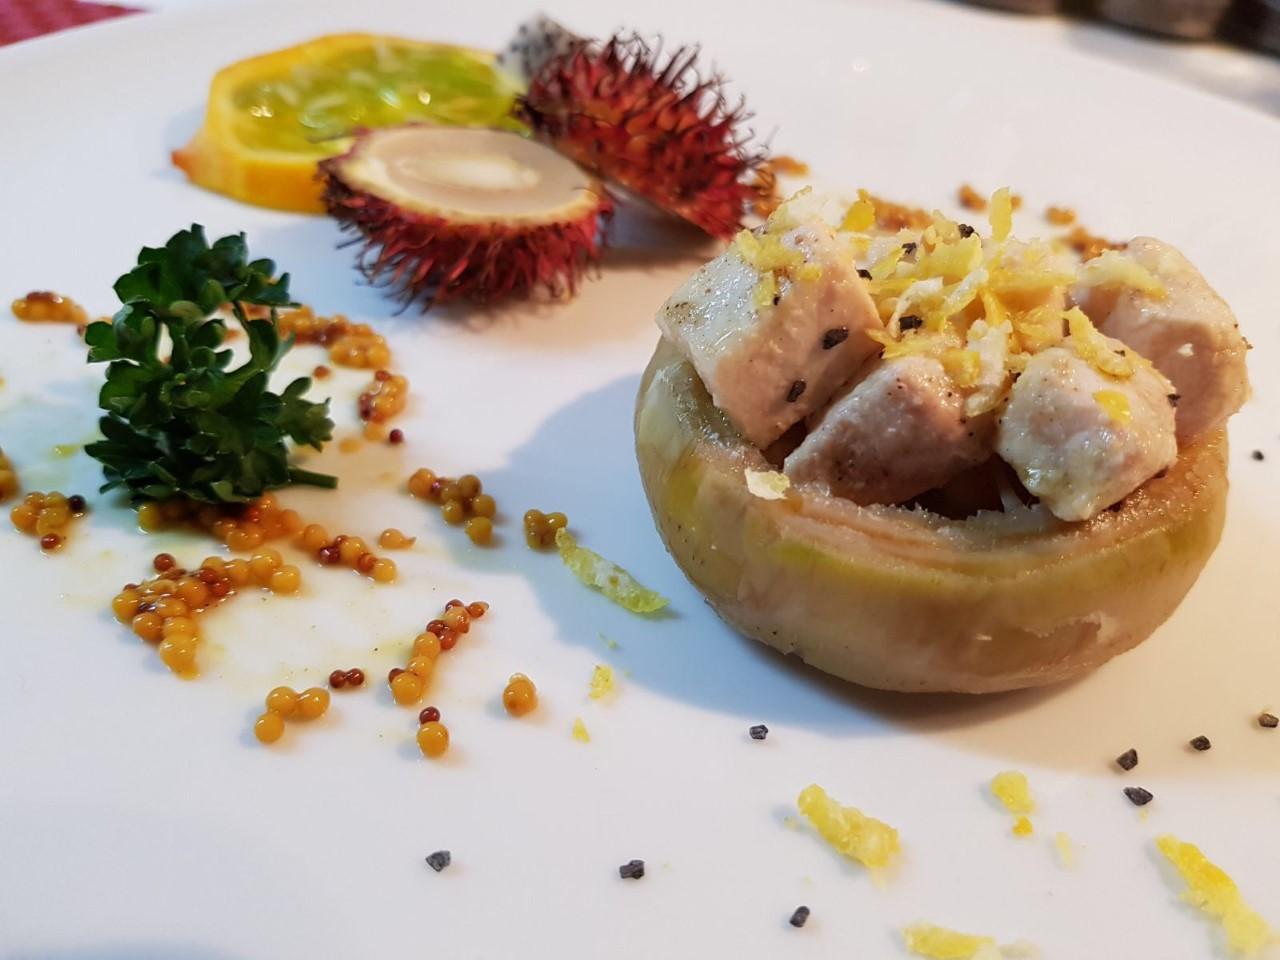 carciofi con spada limone e senape 1